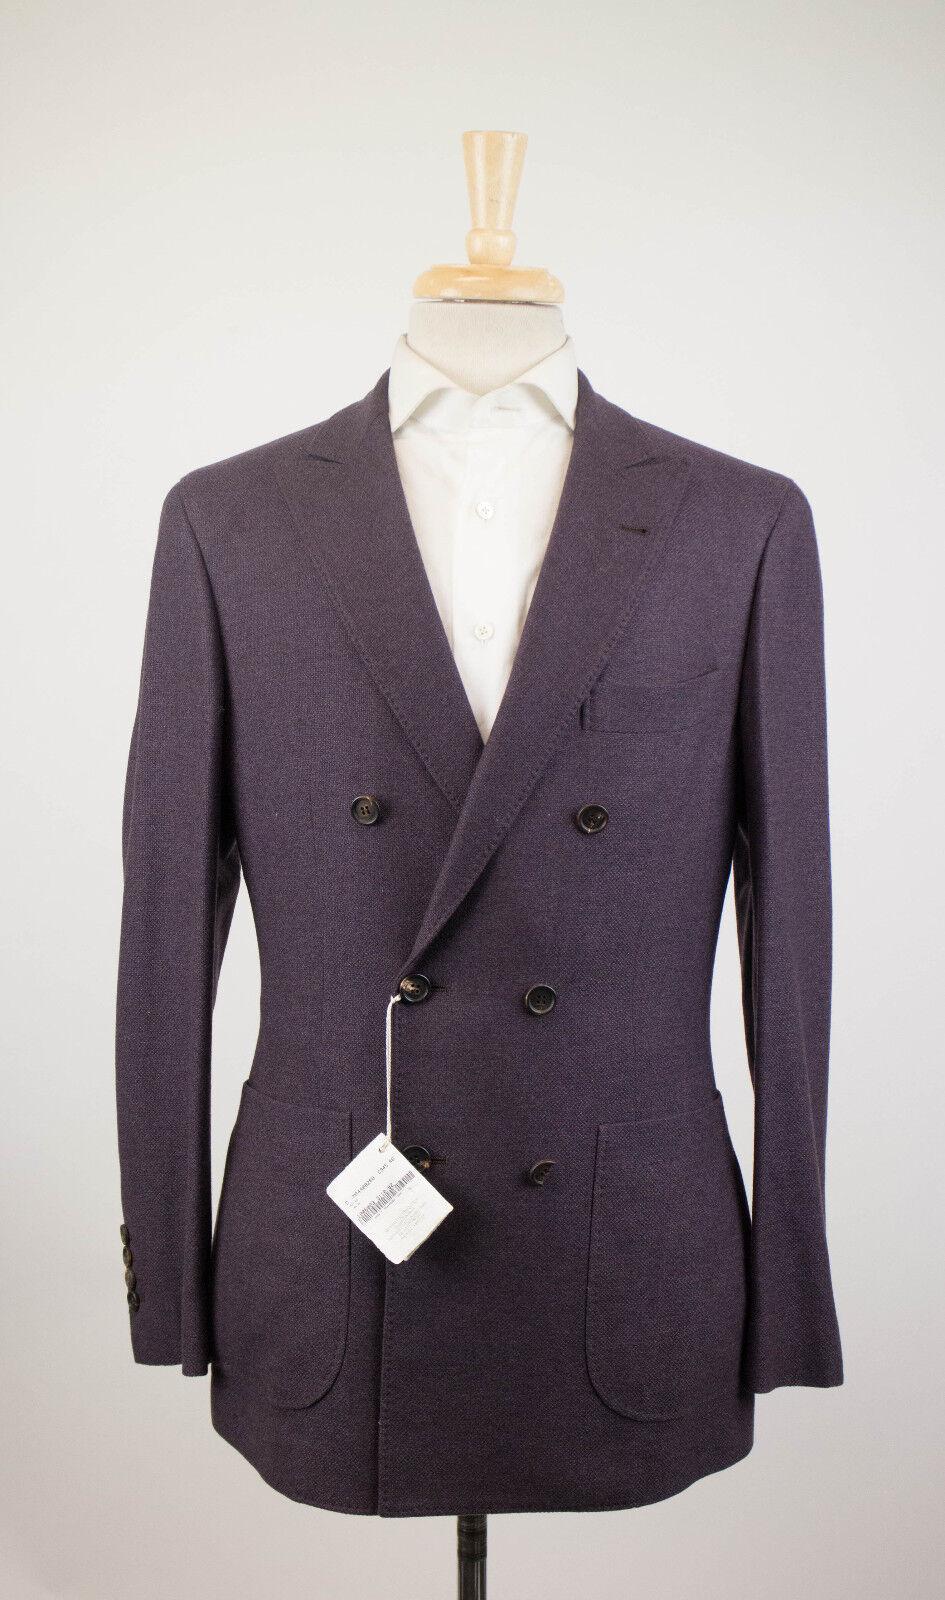 New BRUNELLO CUCINELLI Purple Cashmere Blend DB Sport Coat Size 48 38 R